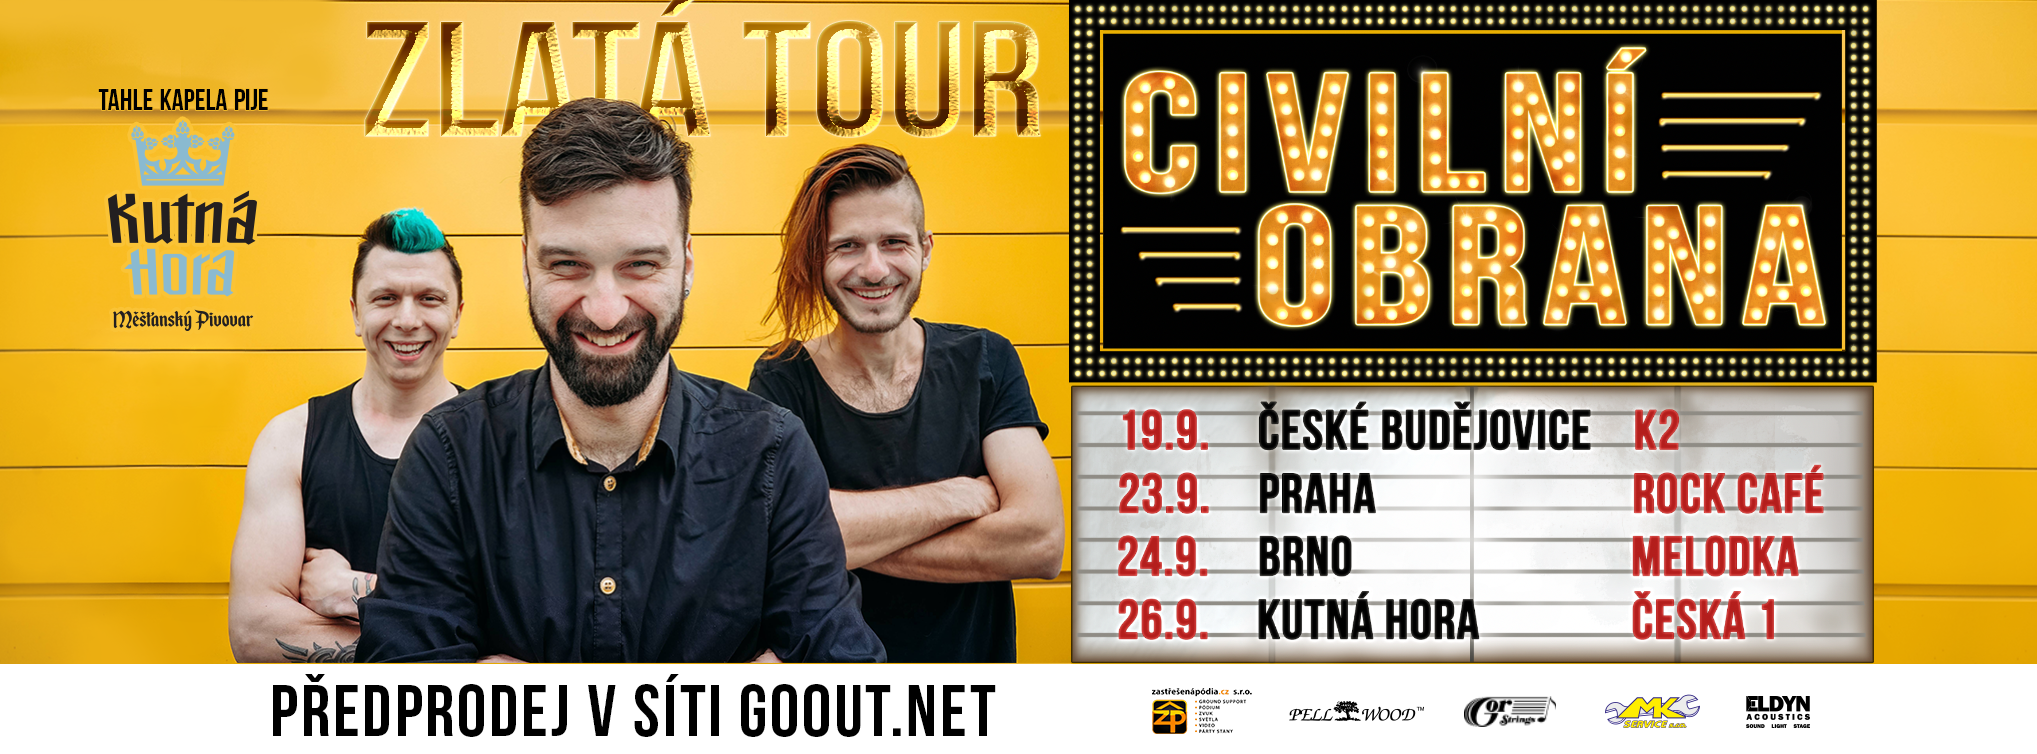 zlata-tour-podzim